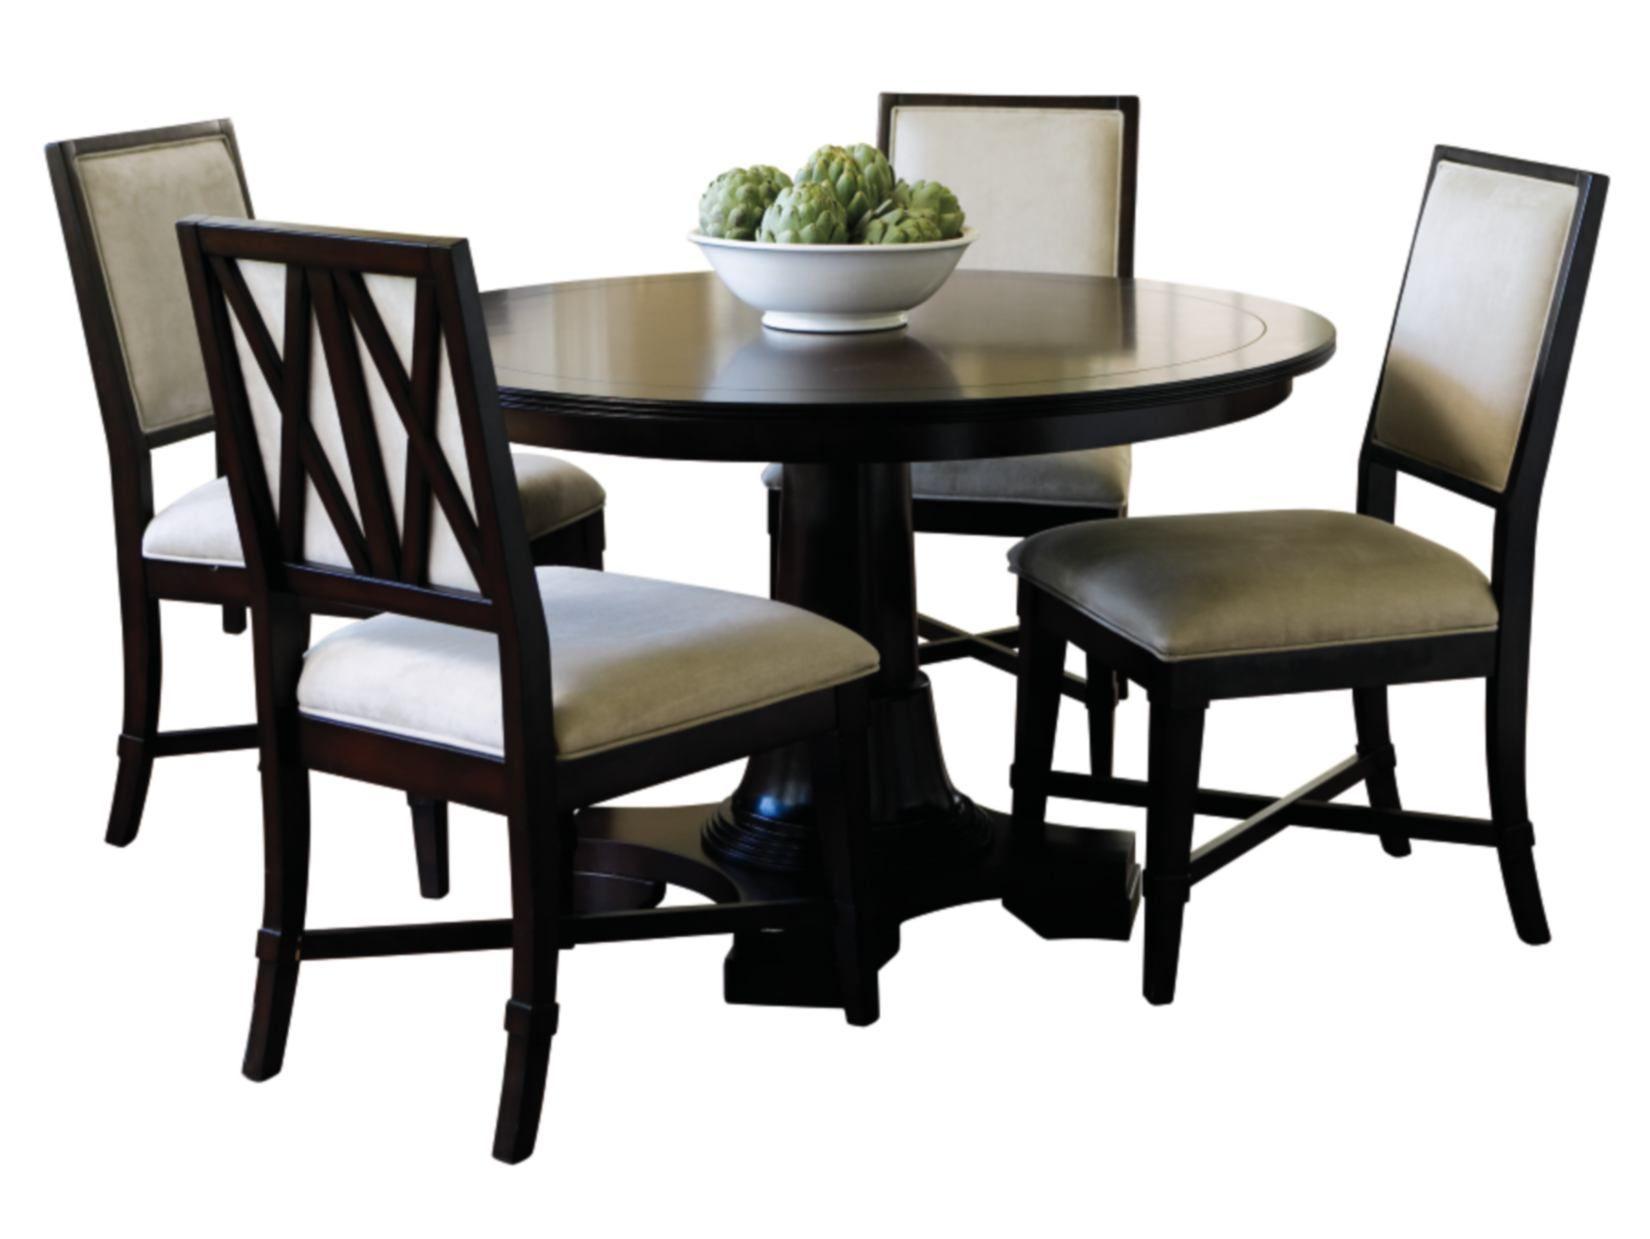 Urban Living 10-PC Round Dinette - Value City Furniture  Value